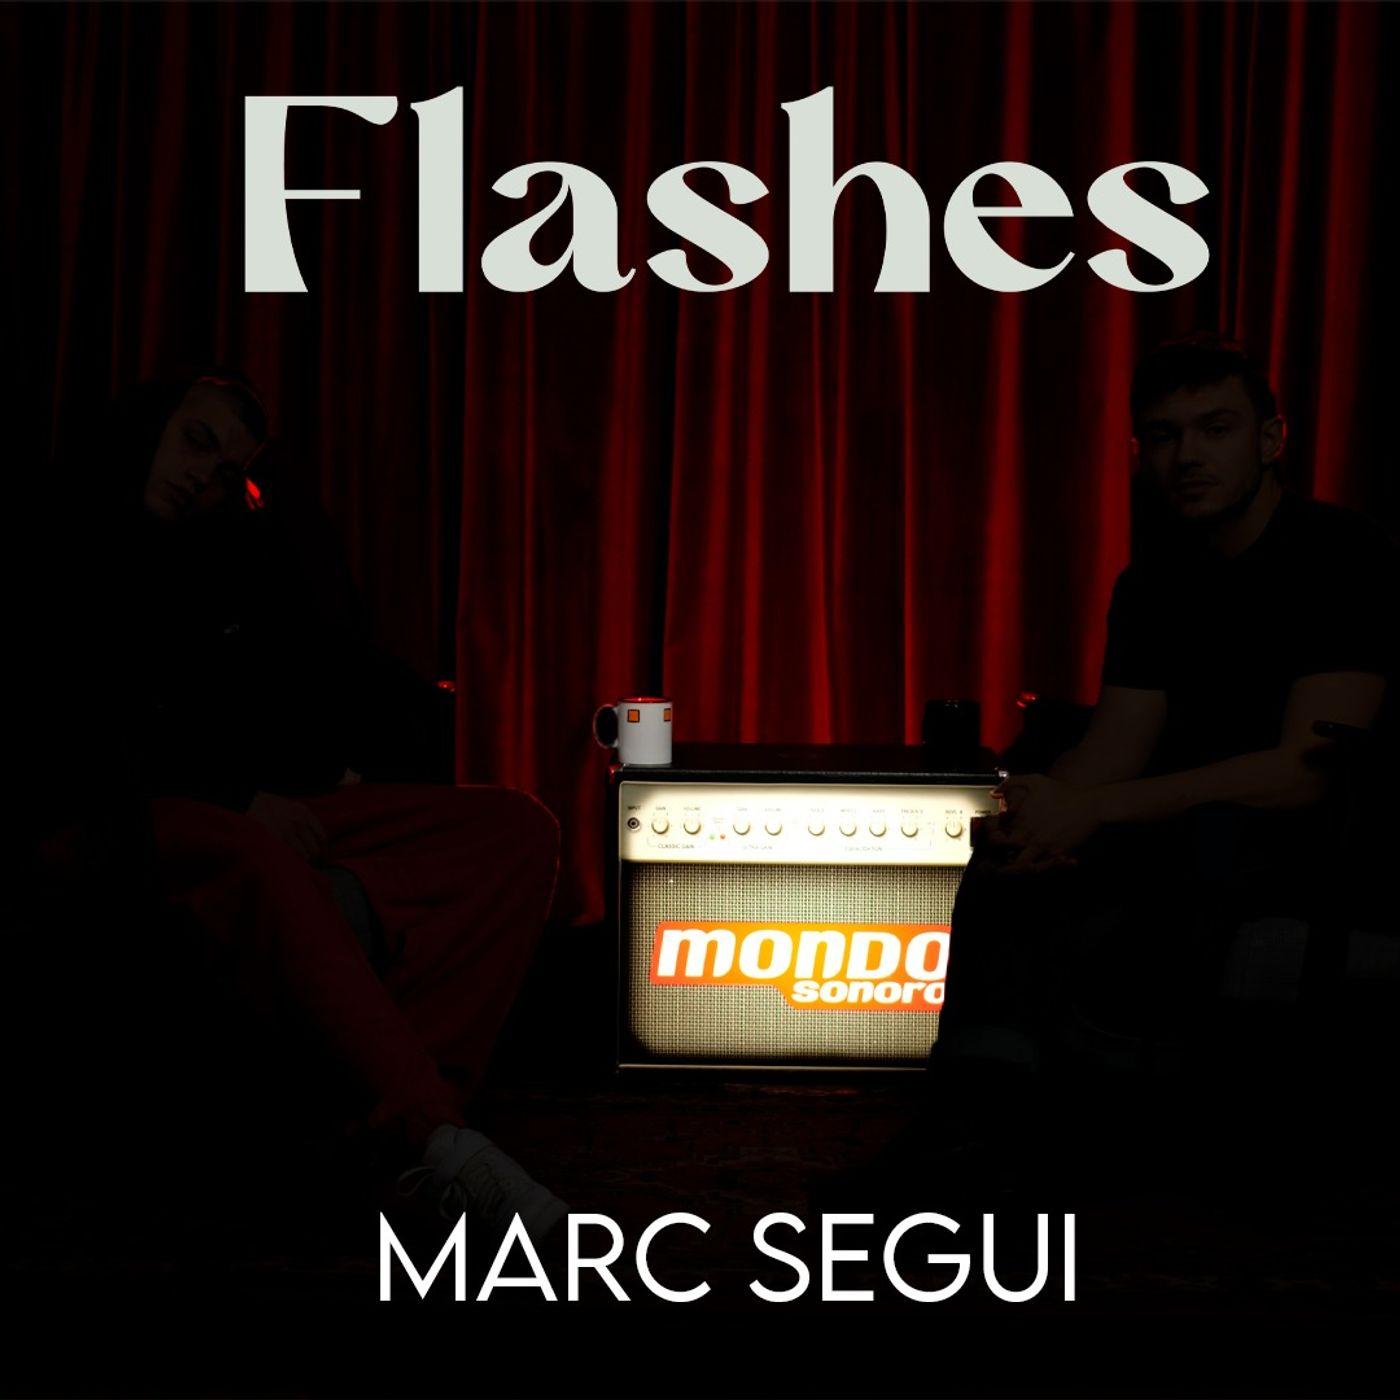 2x06 Marc Seguí: 'Mentiras', 'Tiroteo' remix con Rauw Alejandro.